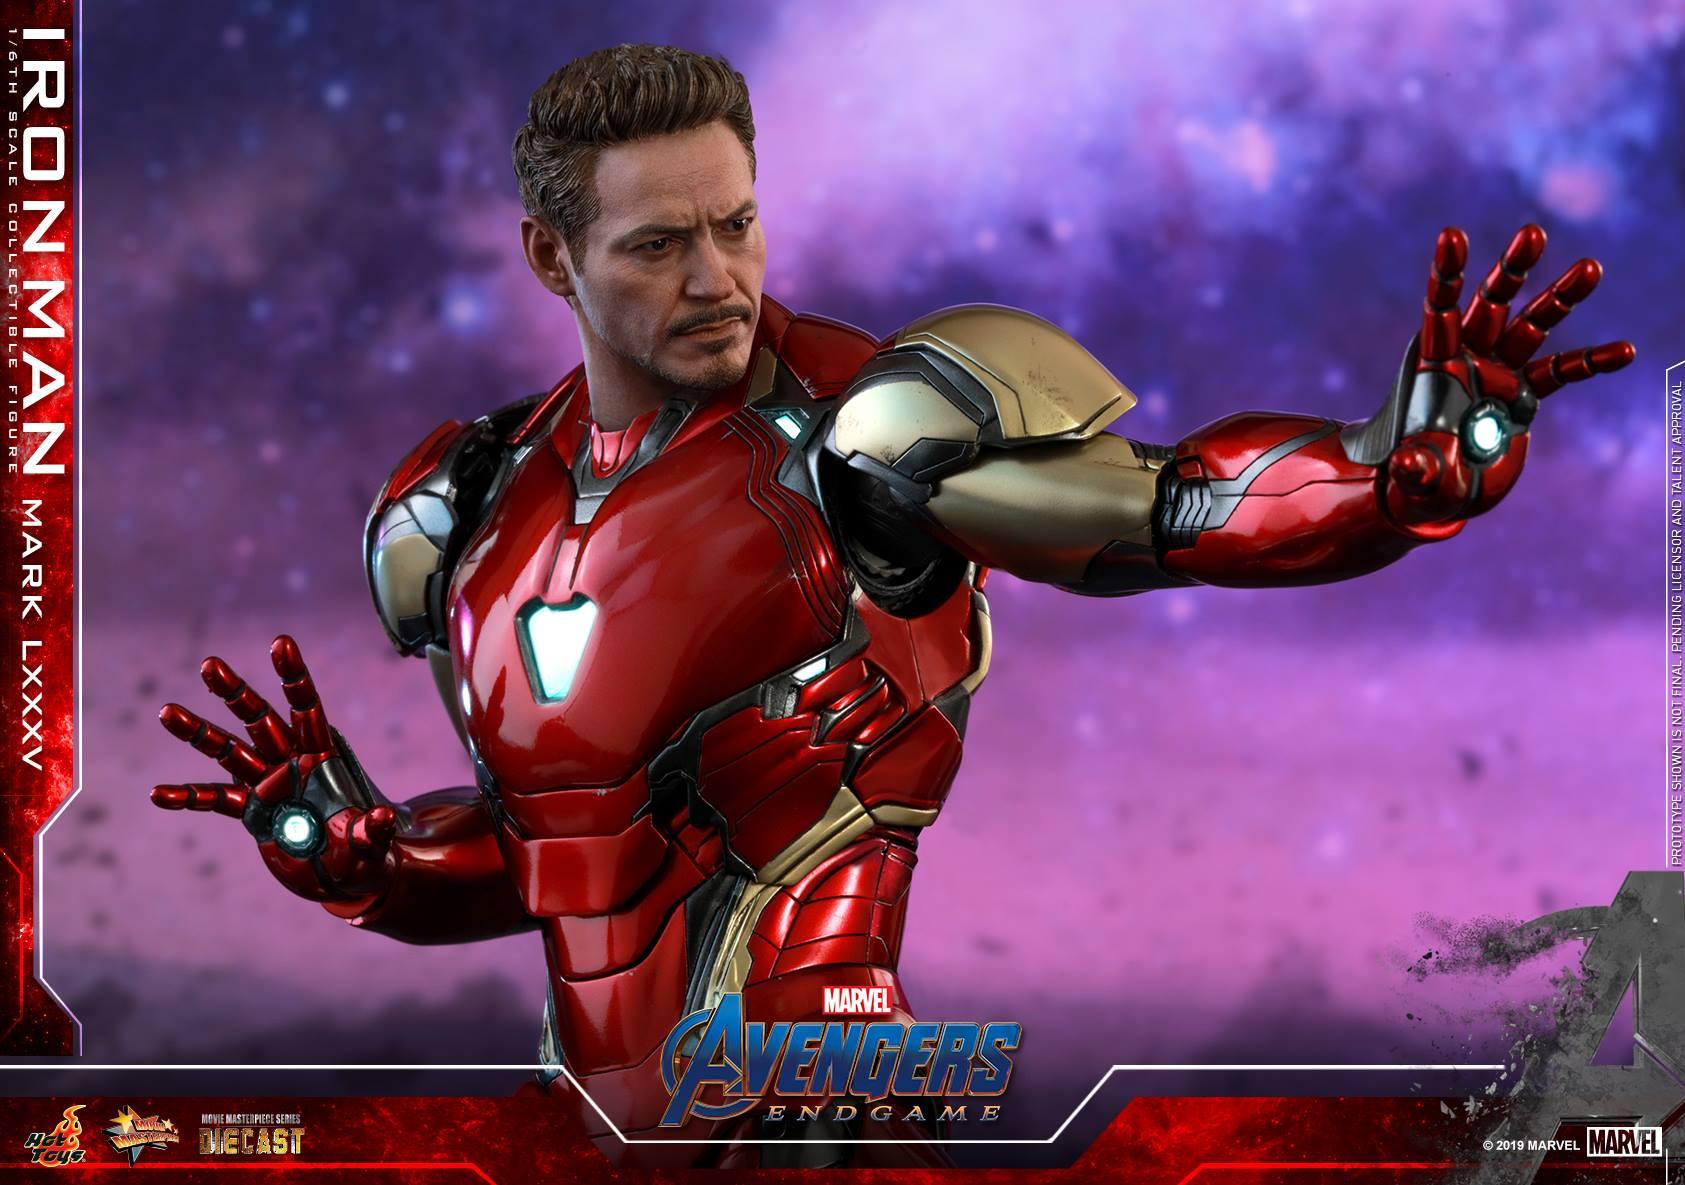 Here's Hot Toys' Avengers: Endgame Iron Man Movie ...